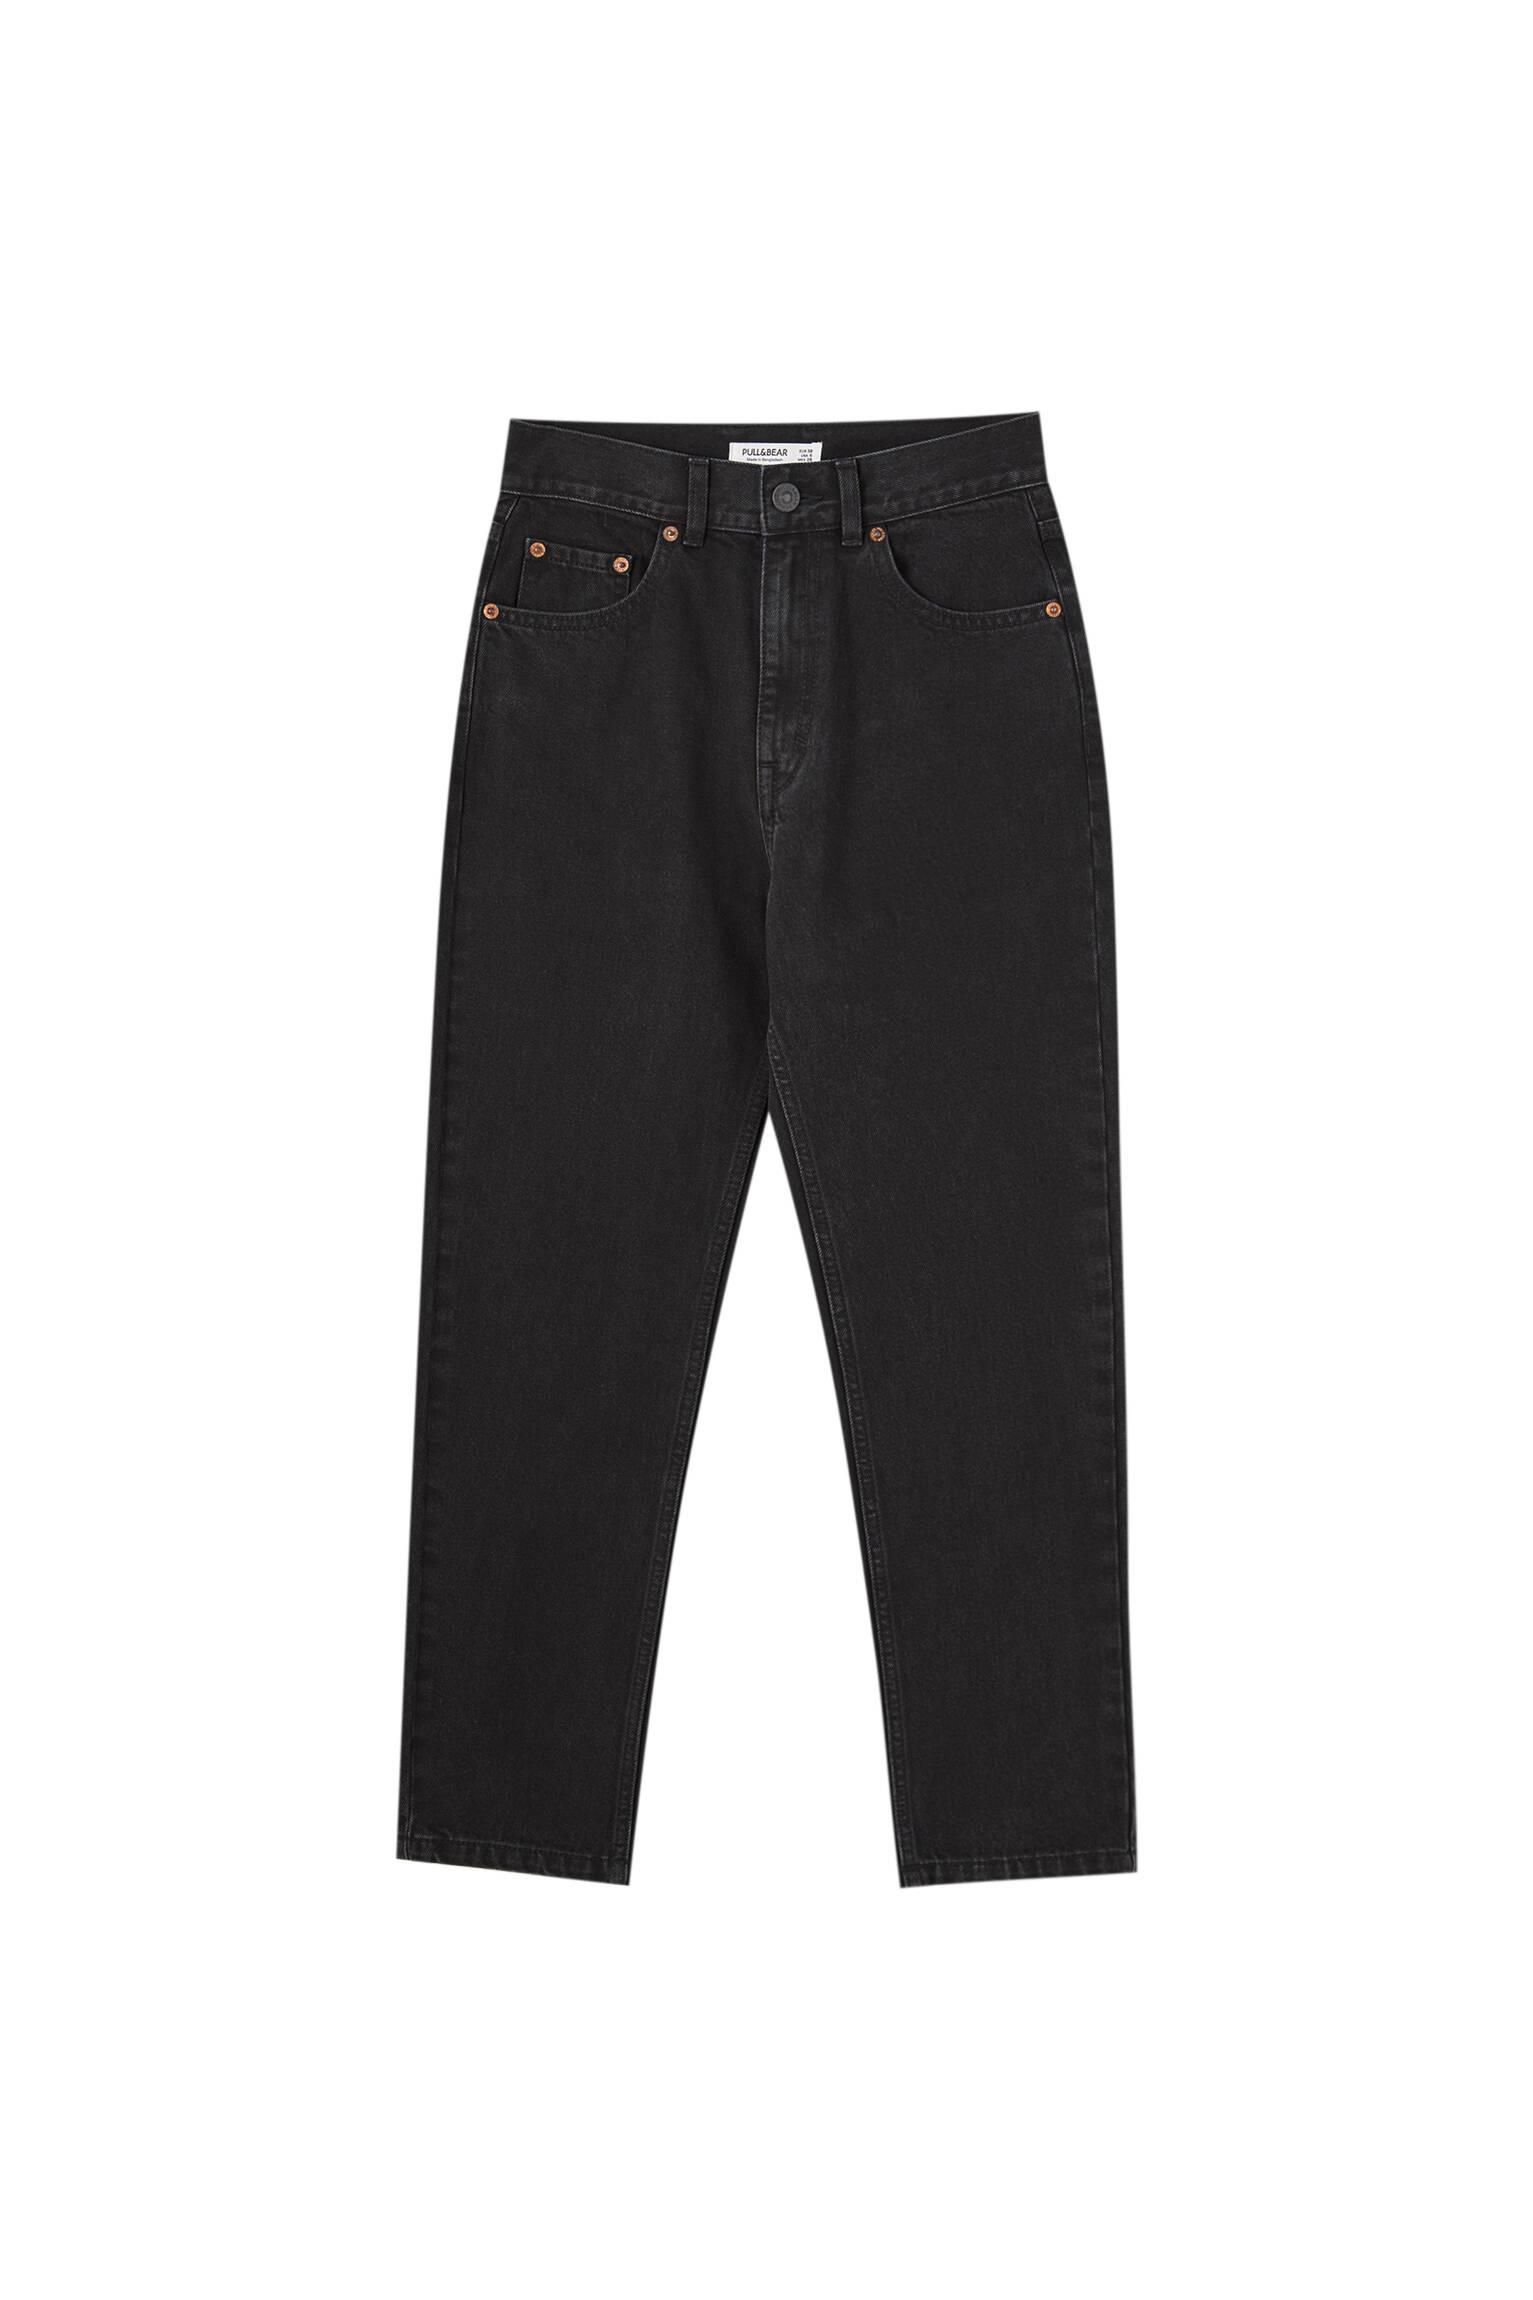 Черный Базовые джинсы mom fit Pull & Bear